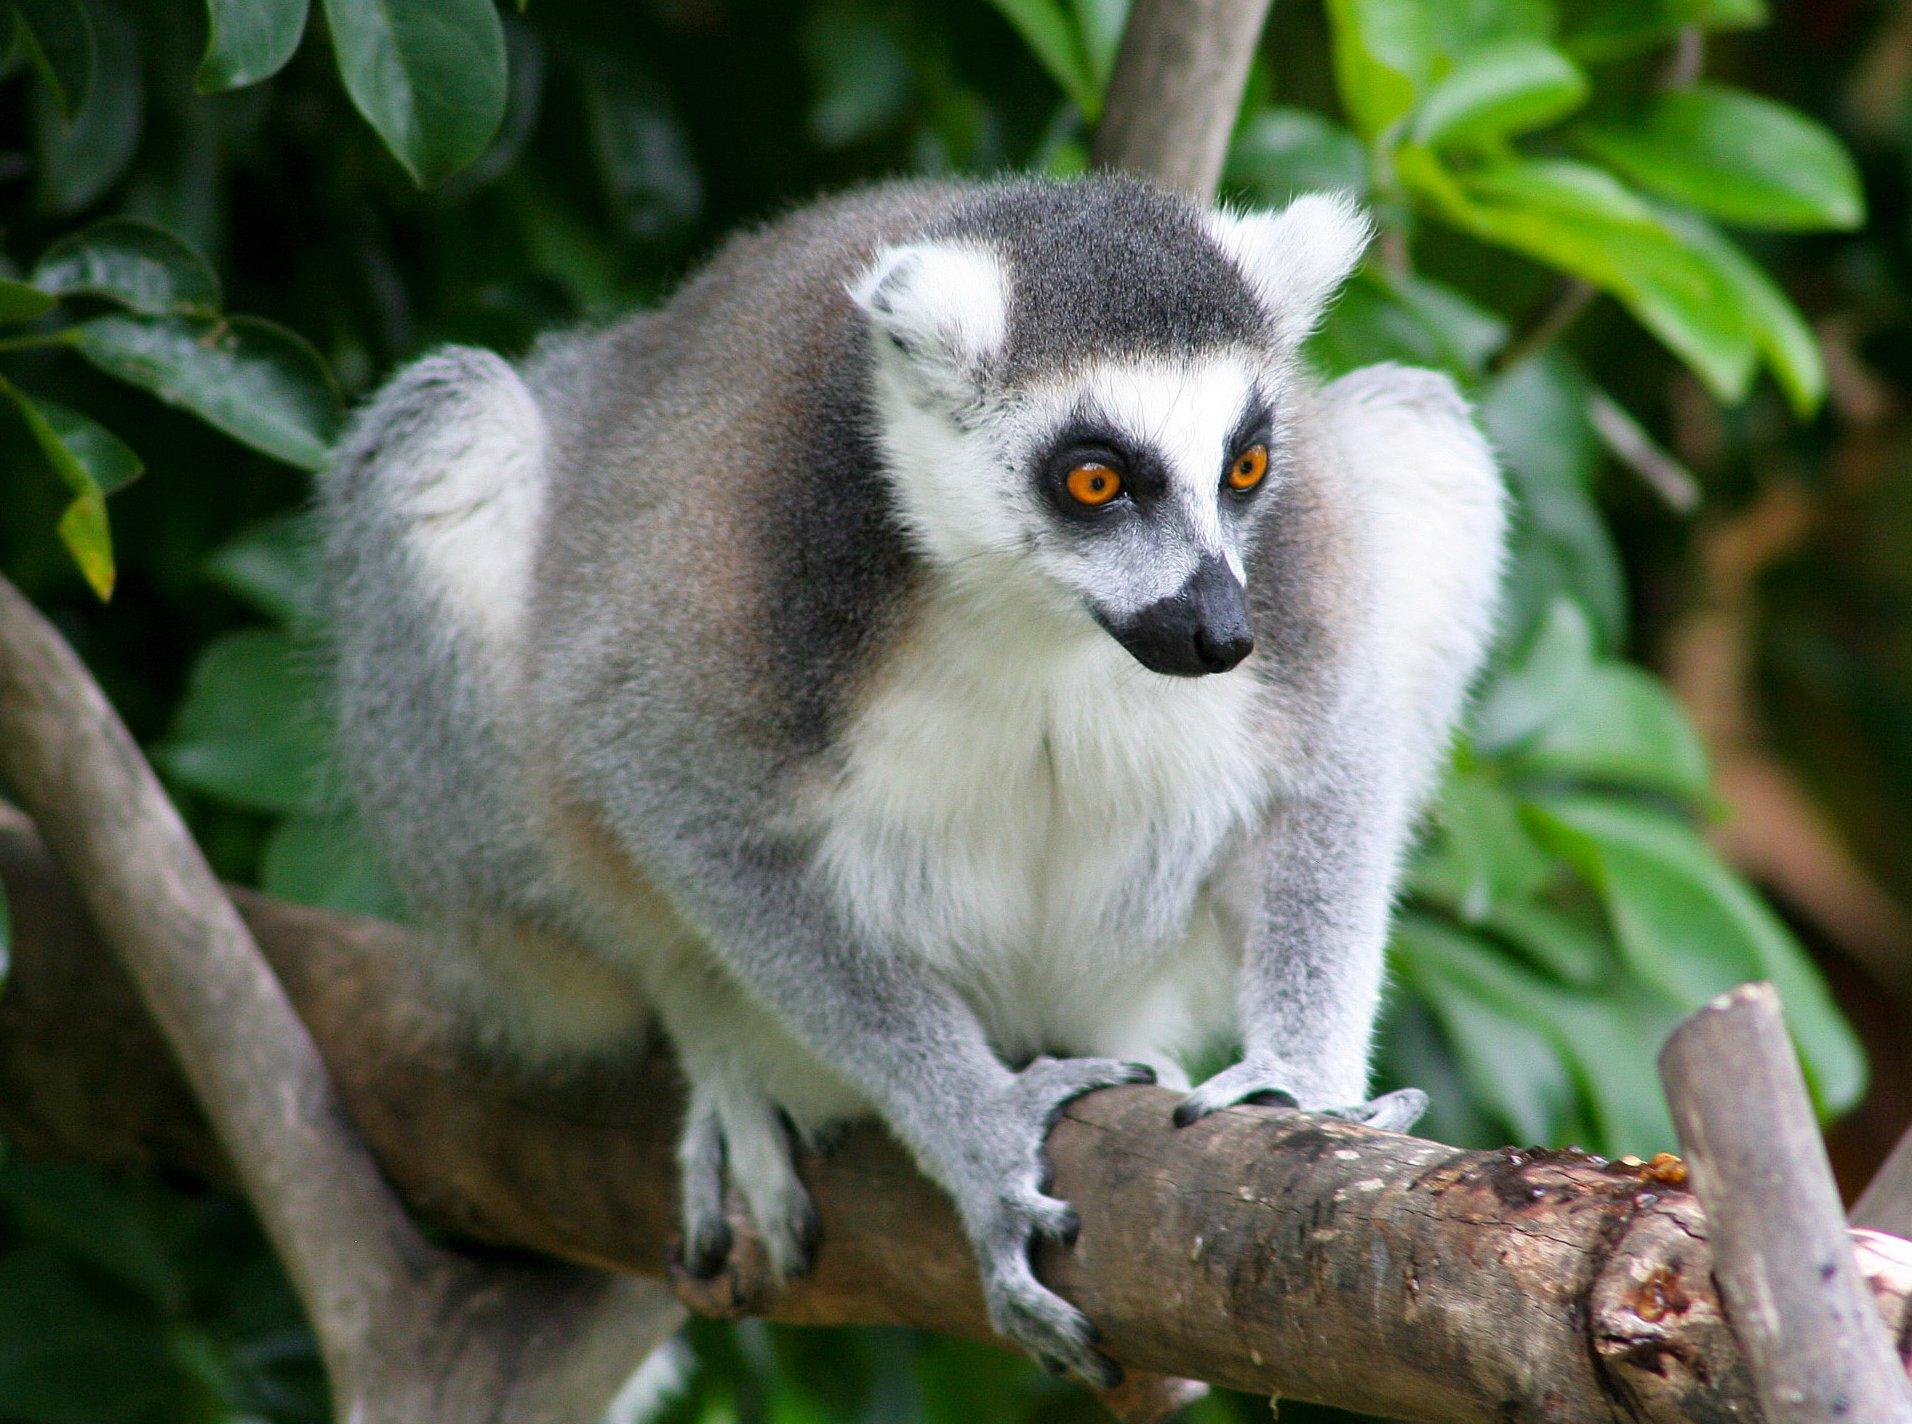 Lemurs are the World's Oldest Living Primates